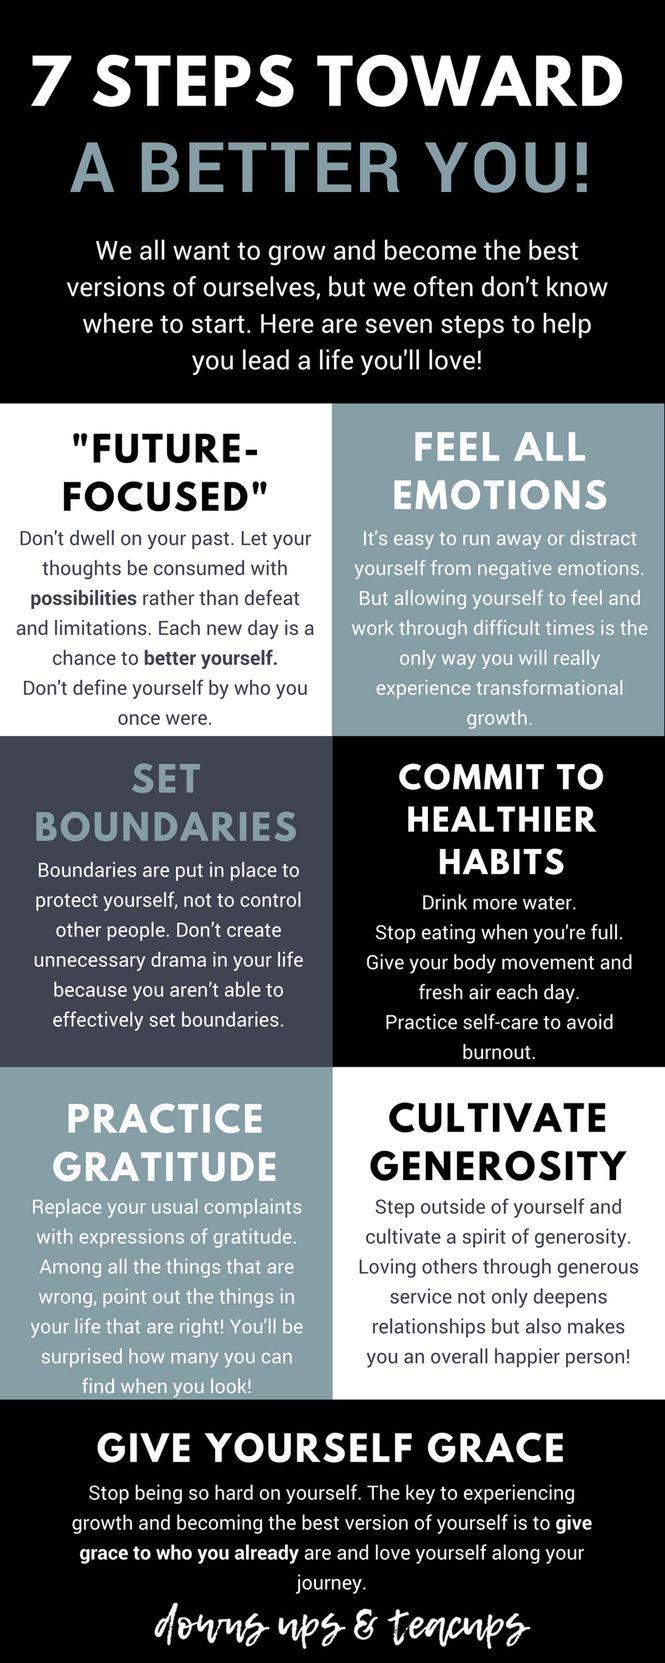 7 Steps Toward A Better You - Downs Ups & Teacups